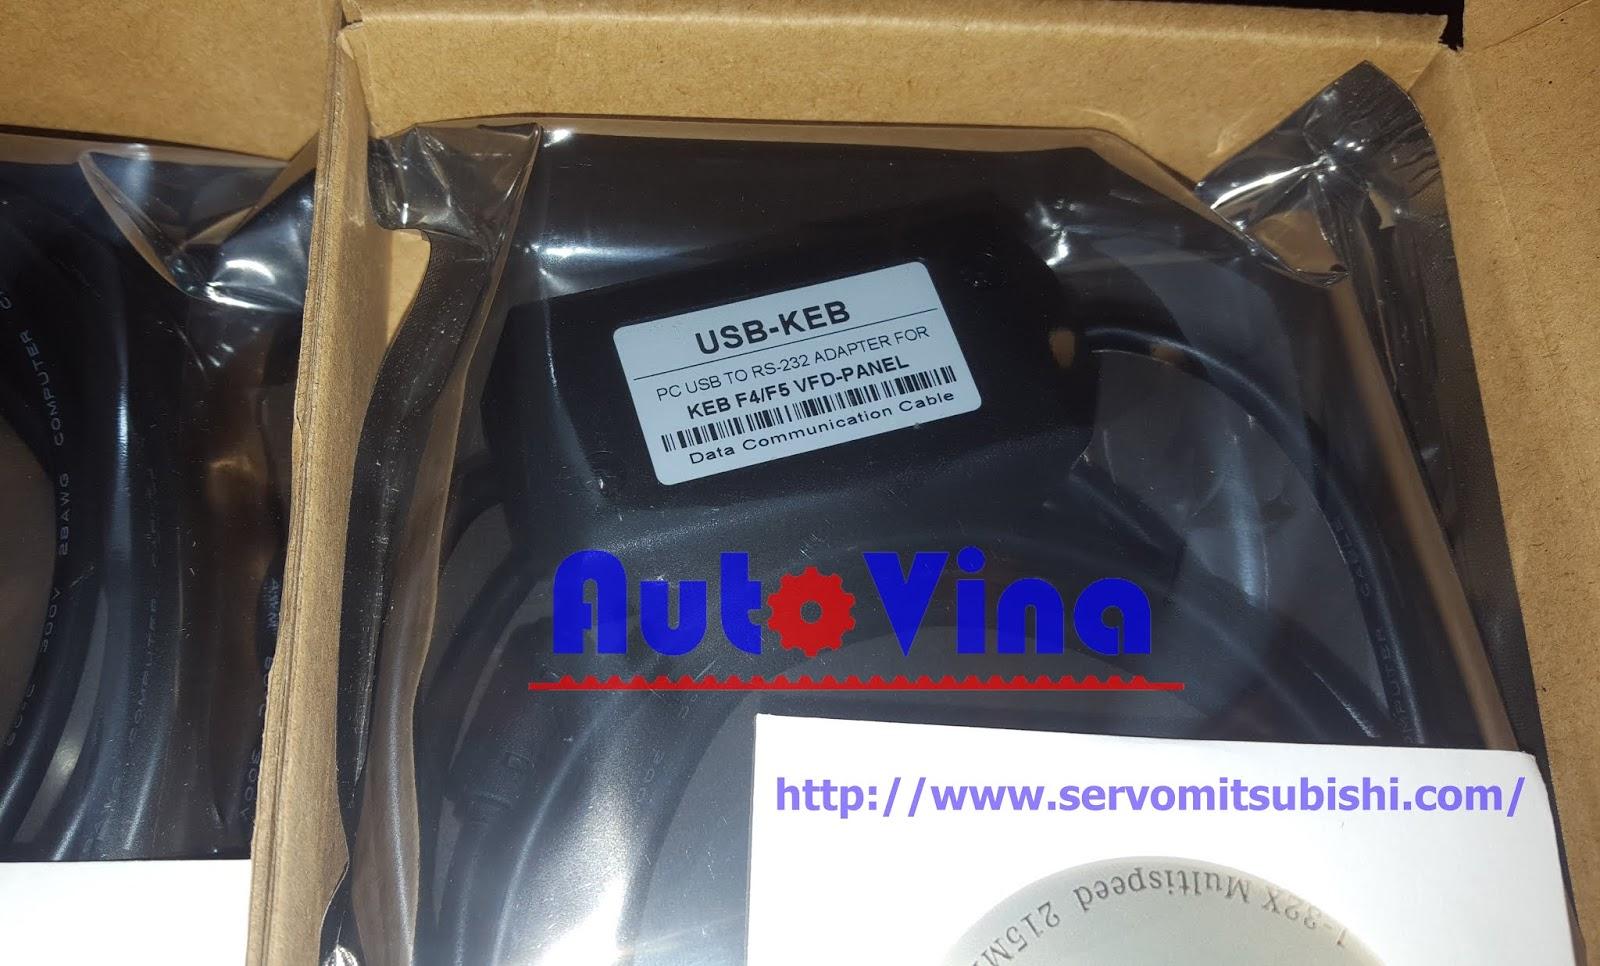 bán cable USB-KEB dùng cho Drives KEB COMBIVERT F4, KEB COMBIVERT F5